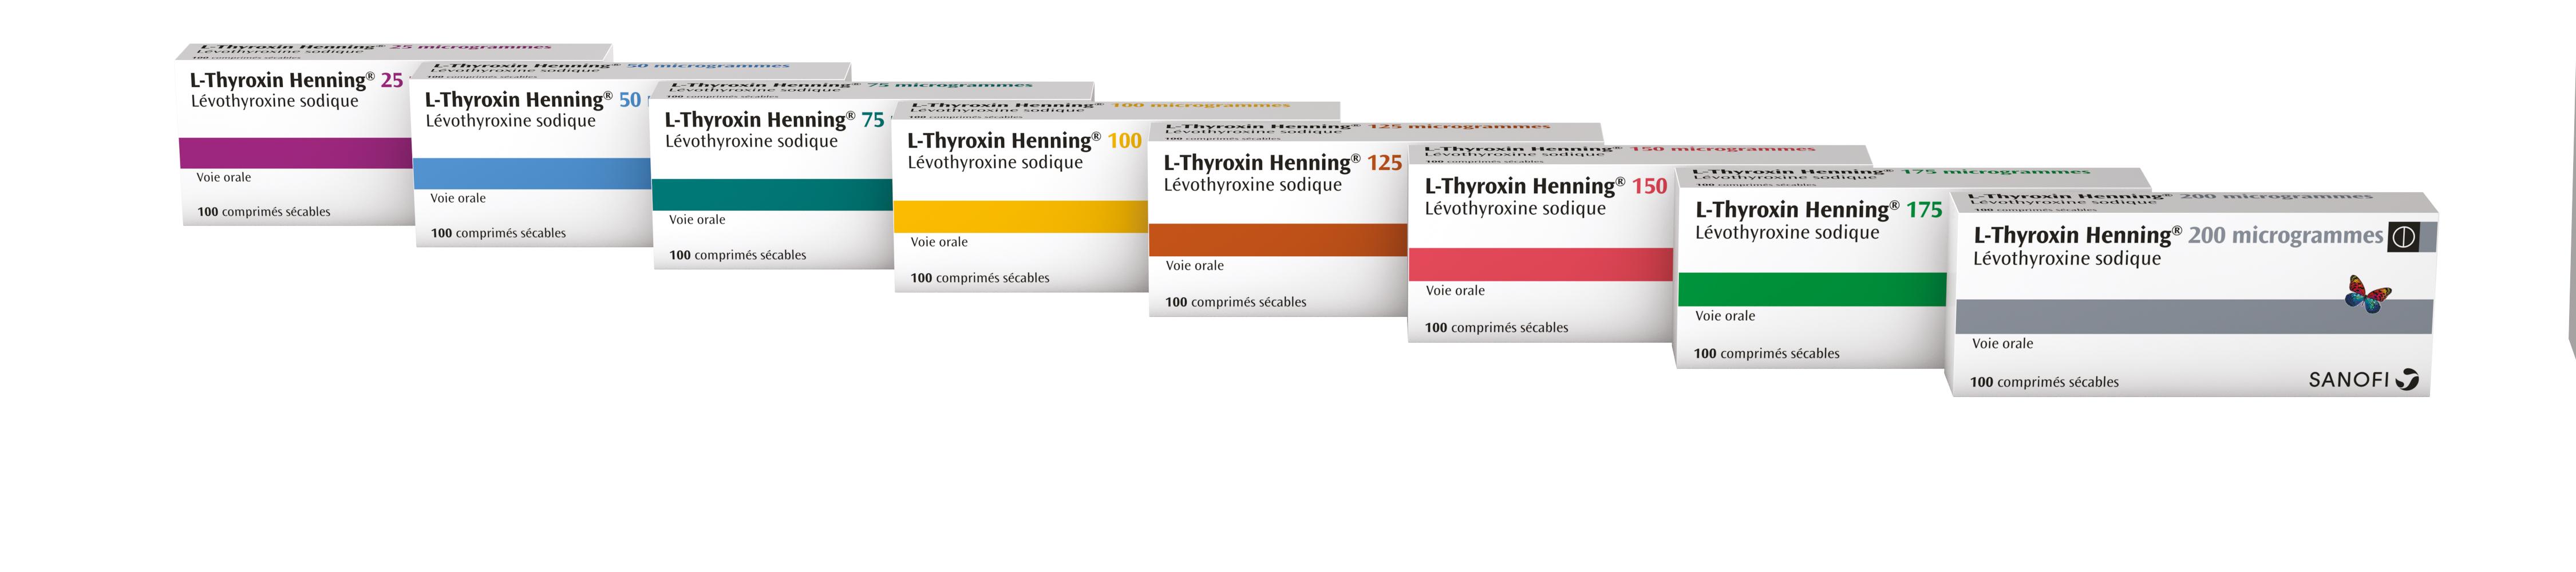 Image gamme L-THYROXIN HENNING